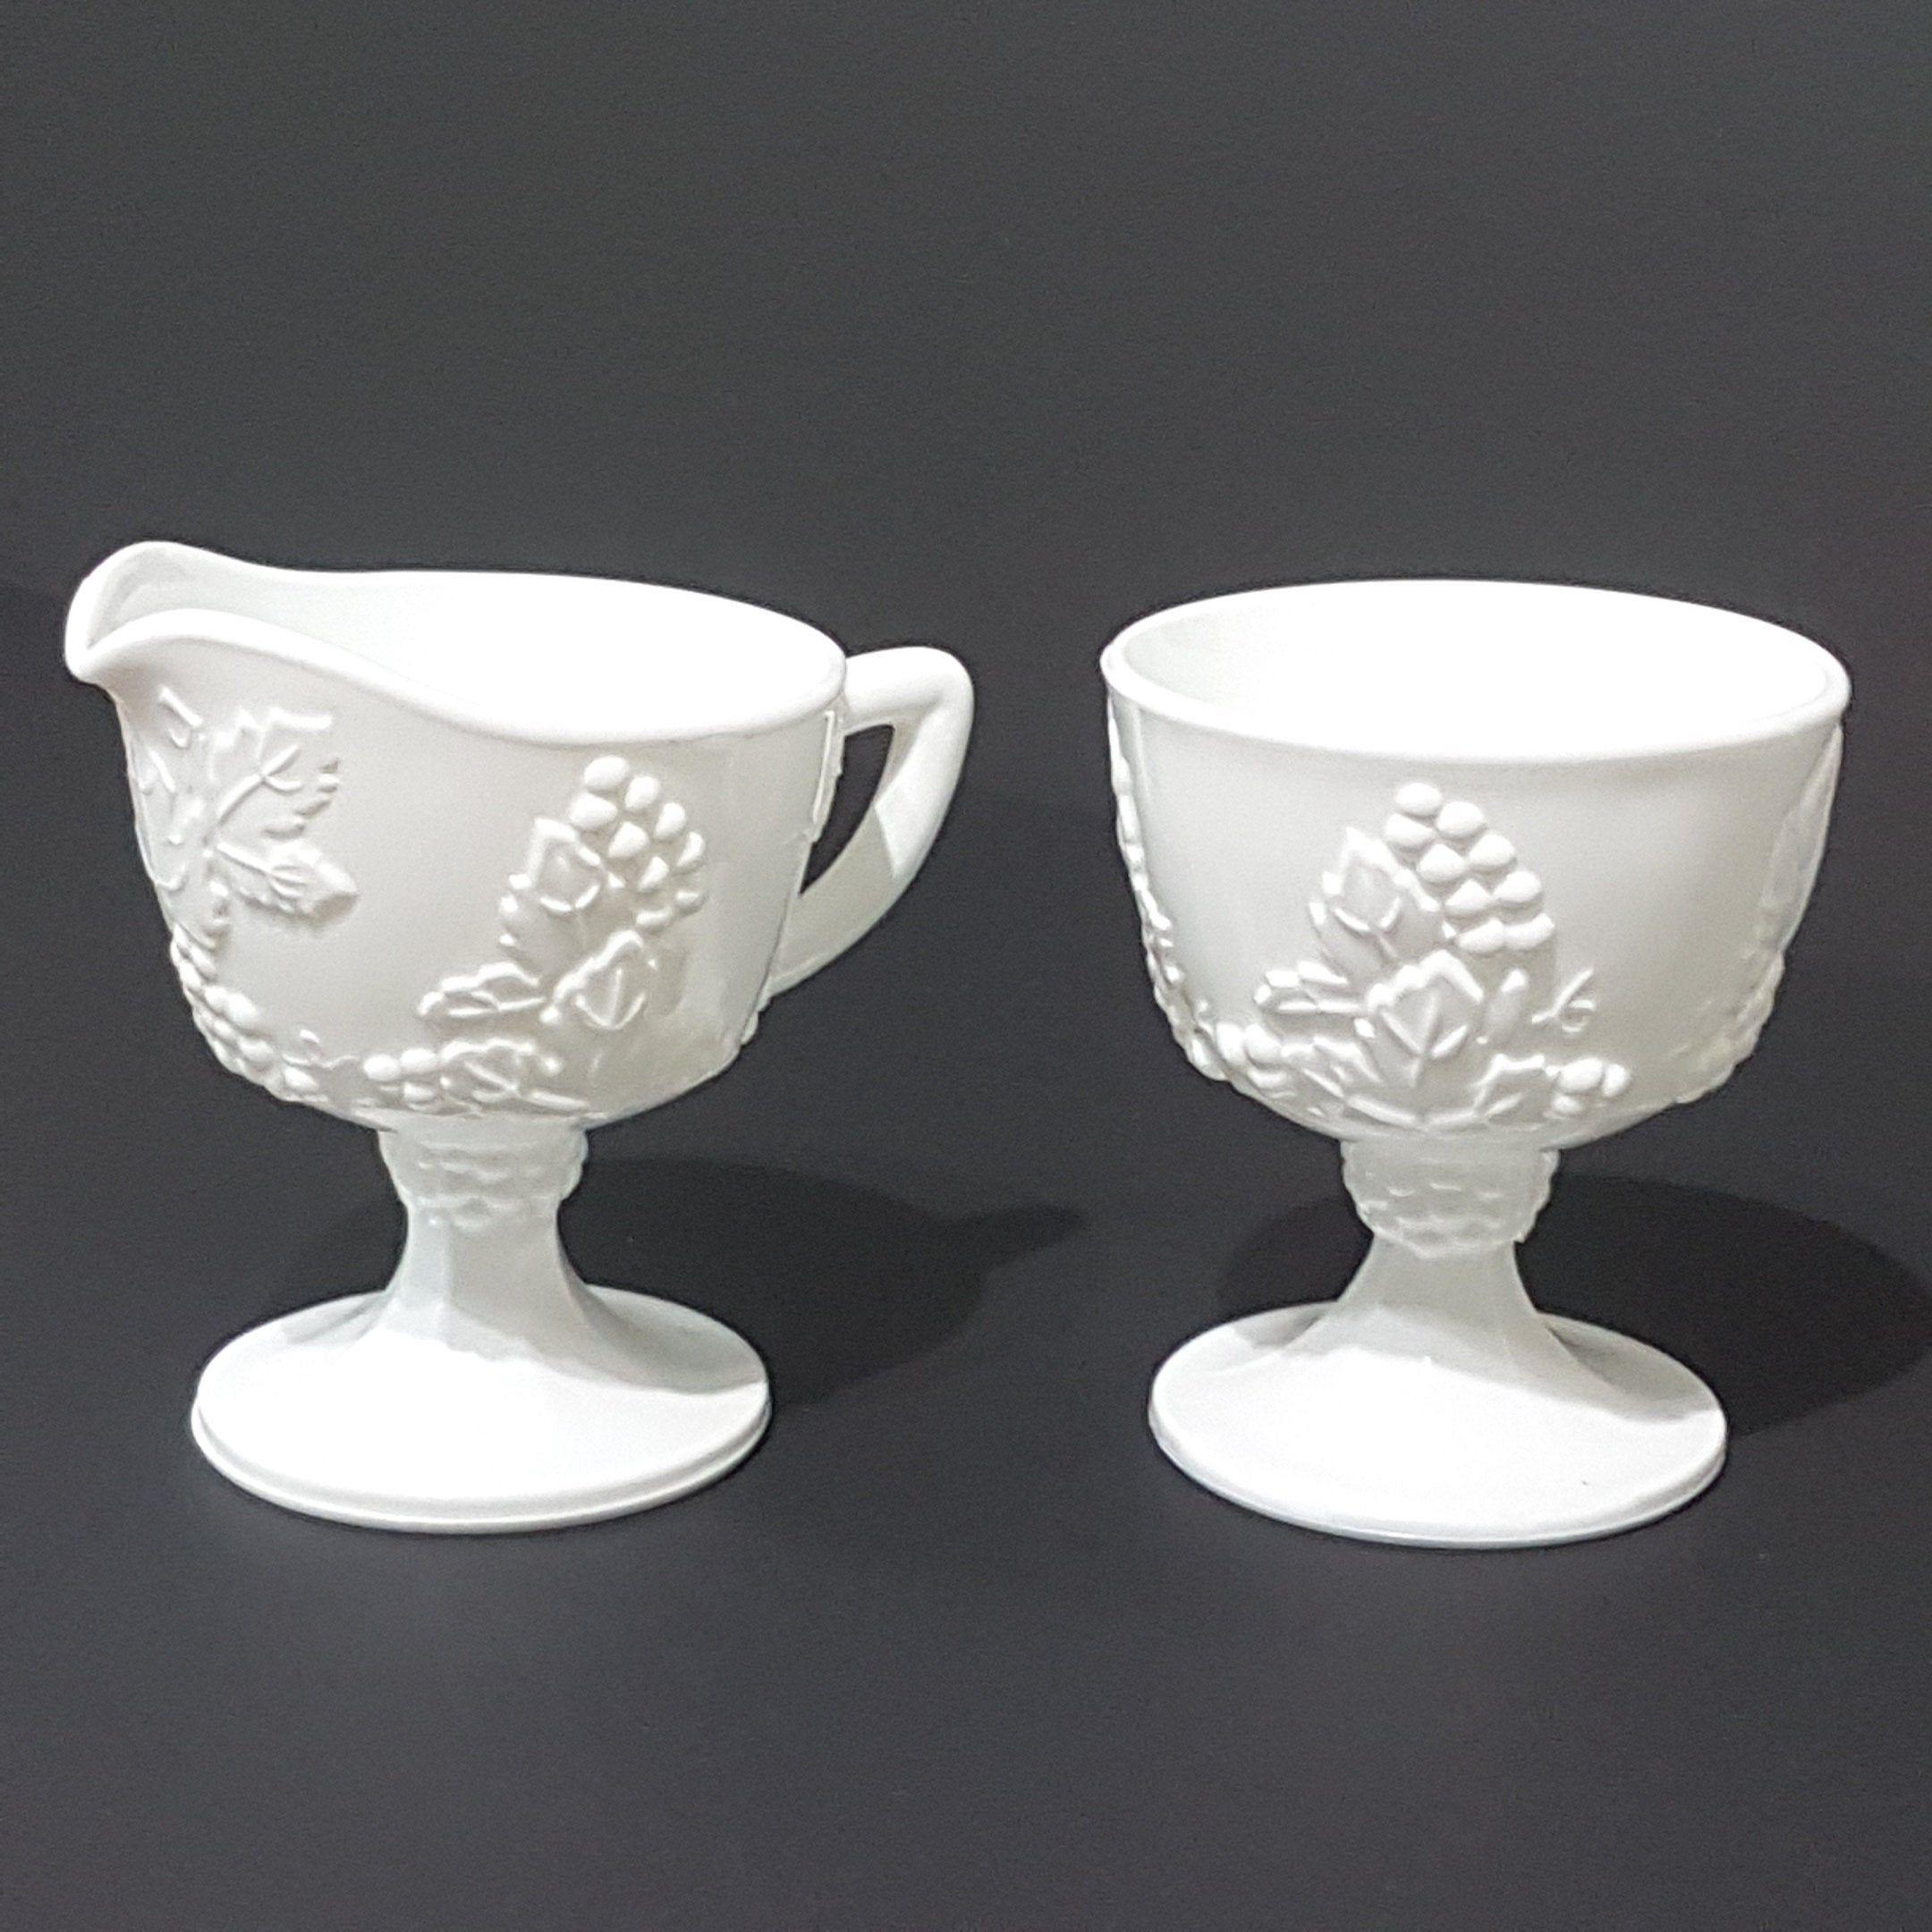 Vintage Milk Glass Sugar /& Creamer Set with Grape Vine Pattern Painted